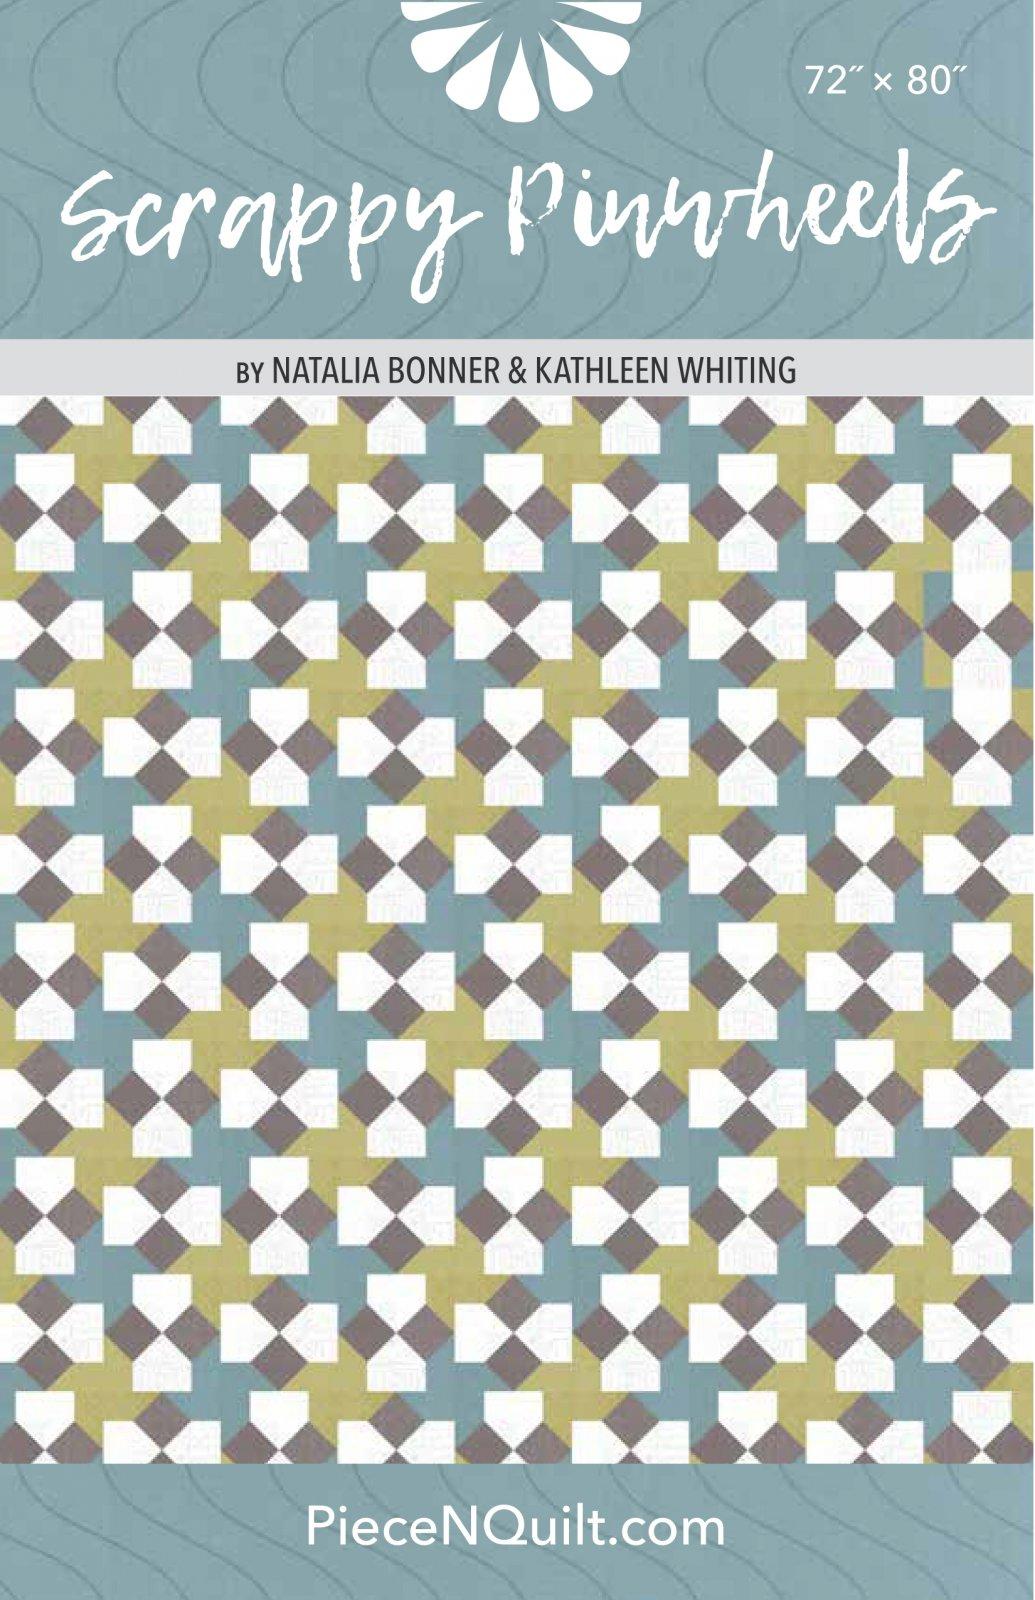 Scrappy Pinwheels Quilt Pattern - PDF Version